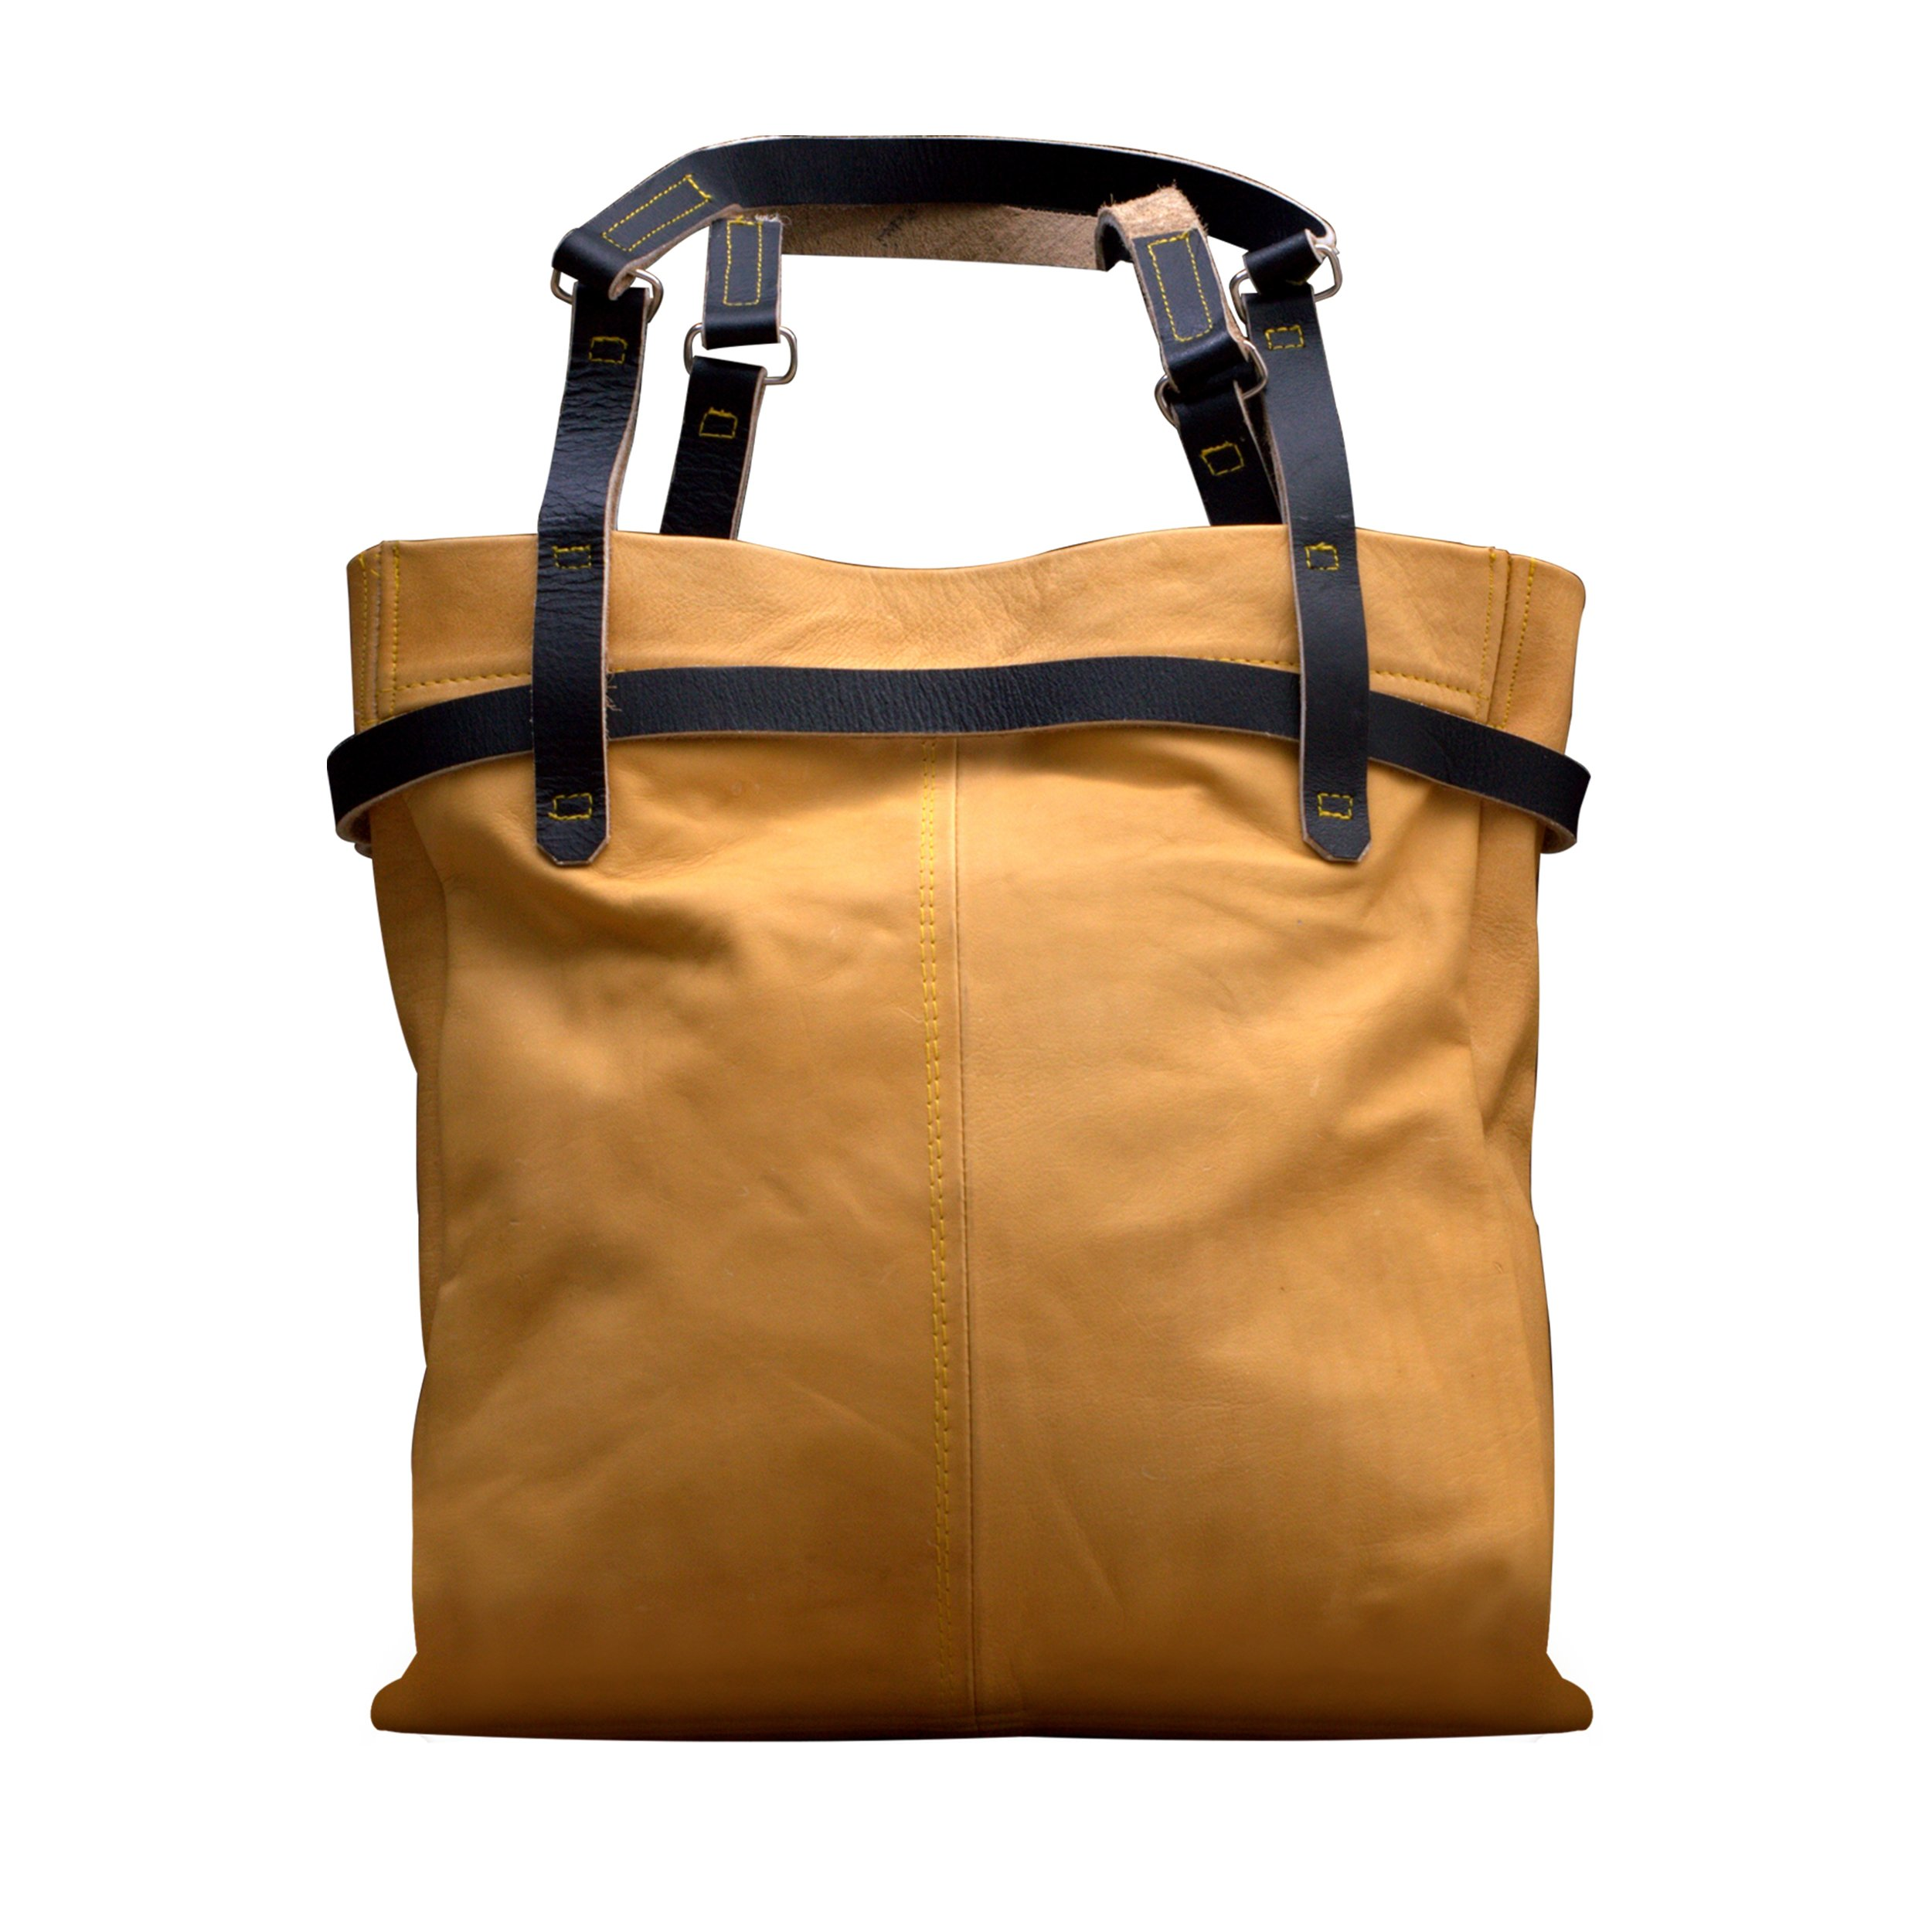 MONT5 Birir Elegant Ladies Leather Bag Large Tote CarryAll Women Soft Handbag